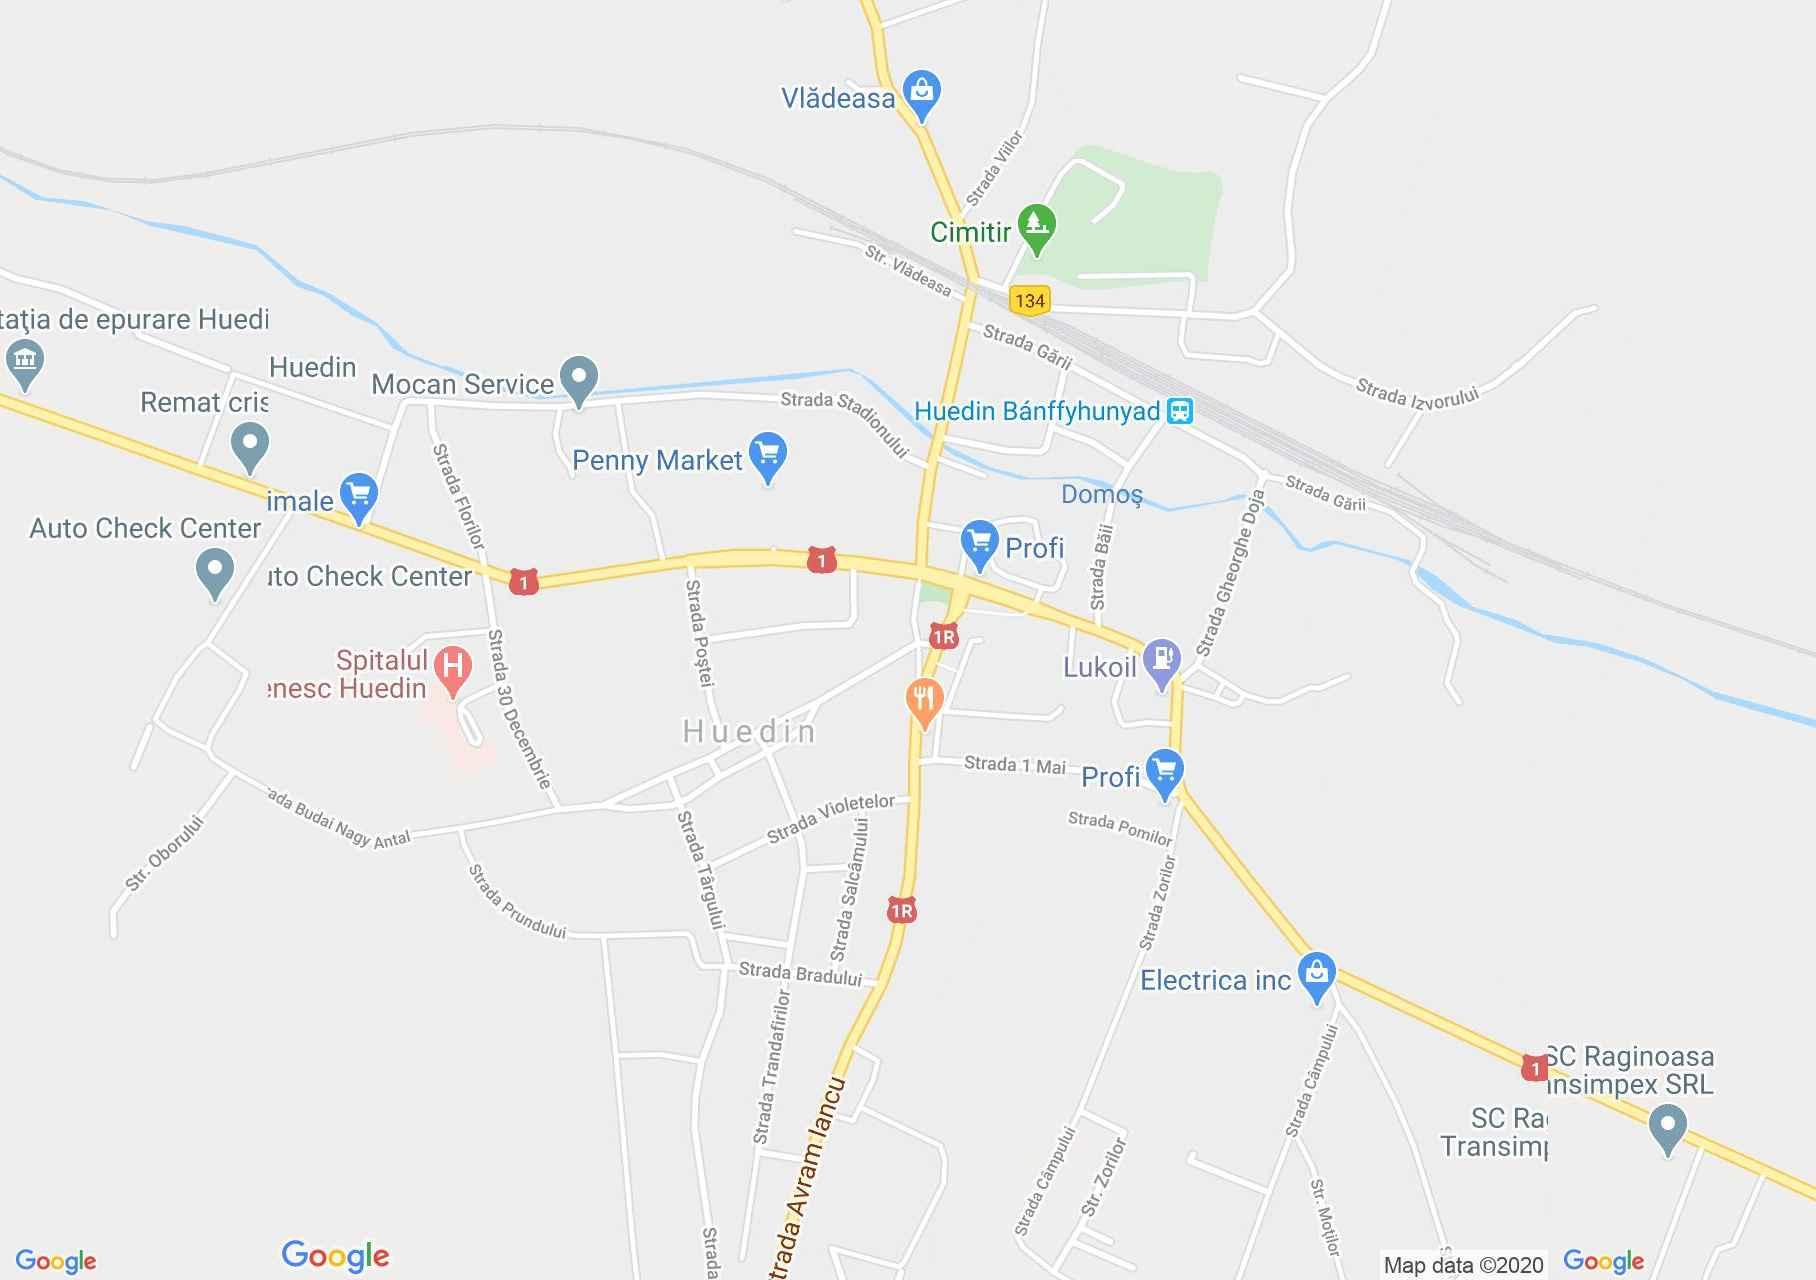 Huedin, Interactive tourist map